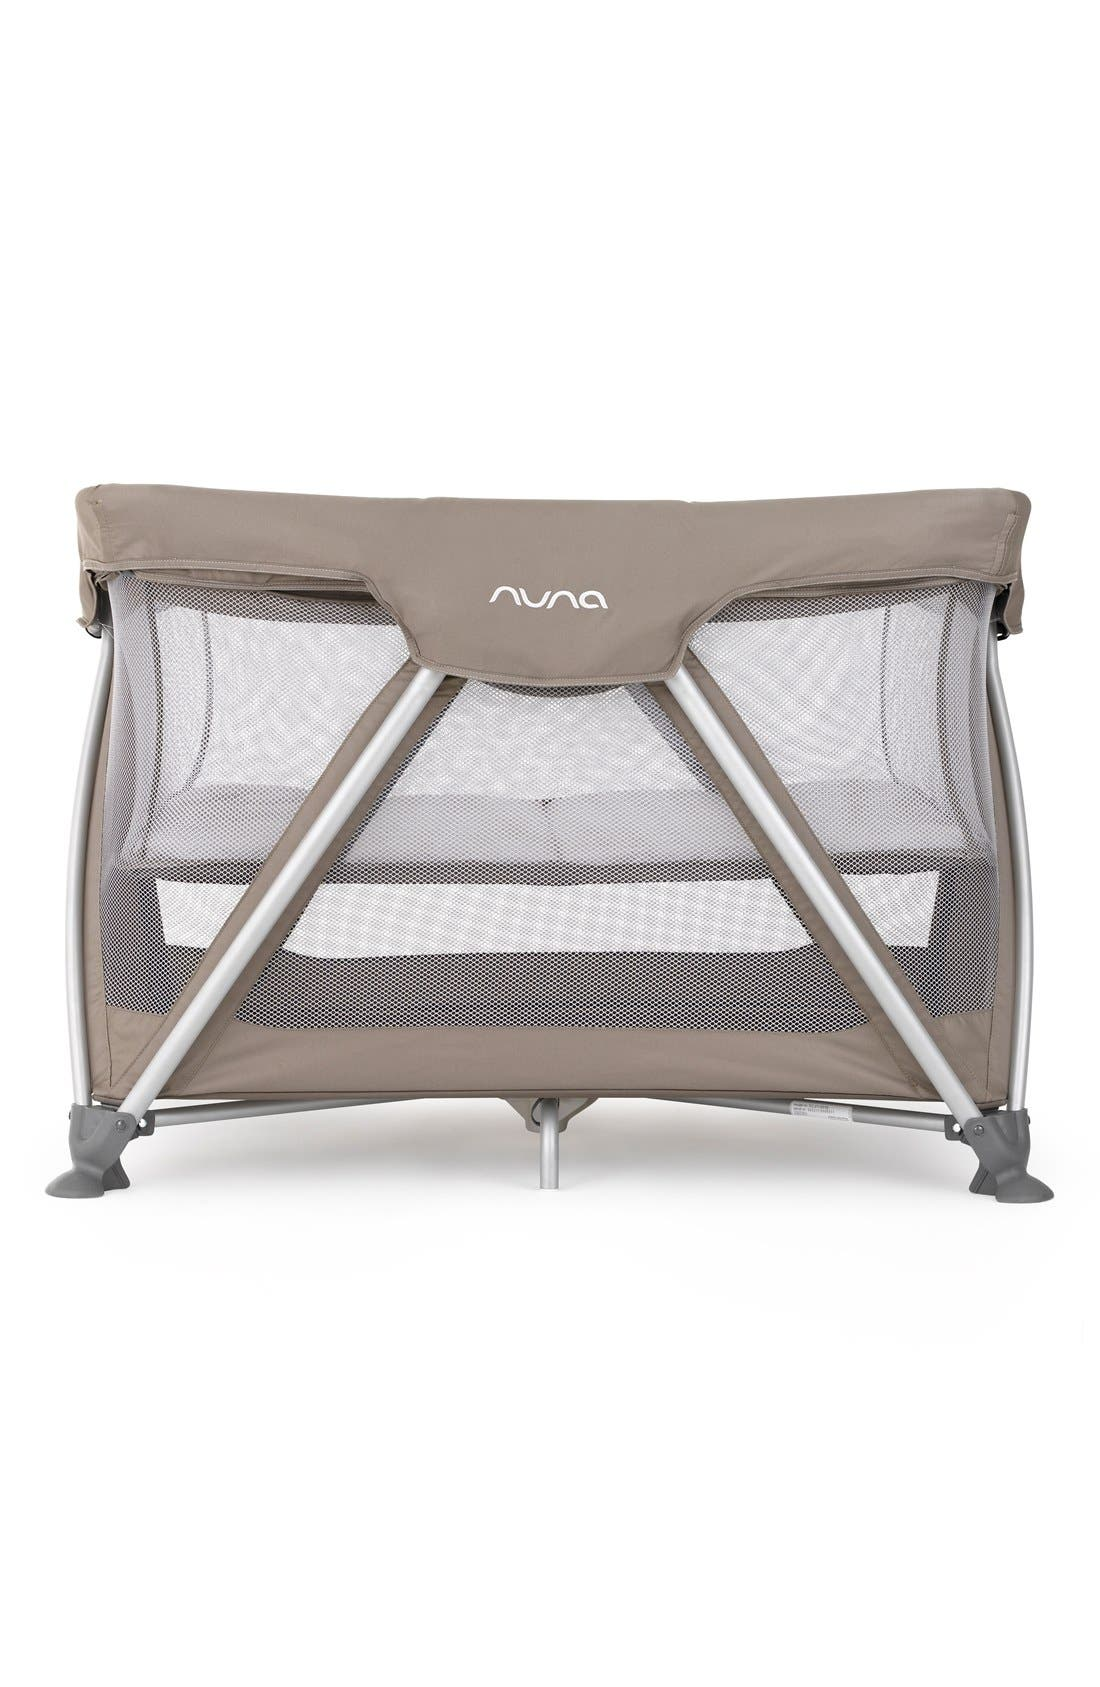 Main Image - nuna 'SENA™' Travel Crib